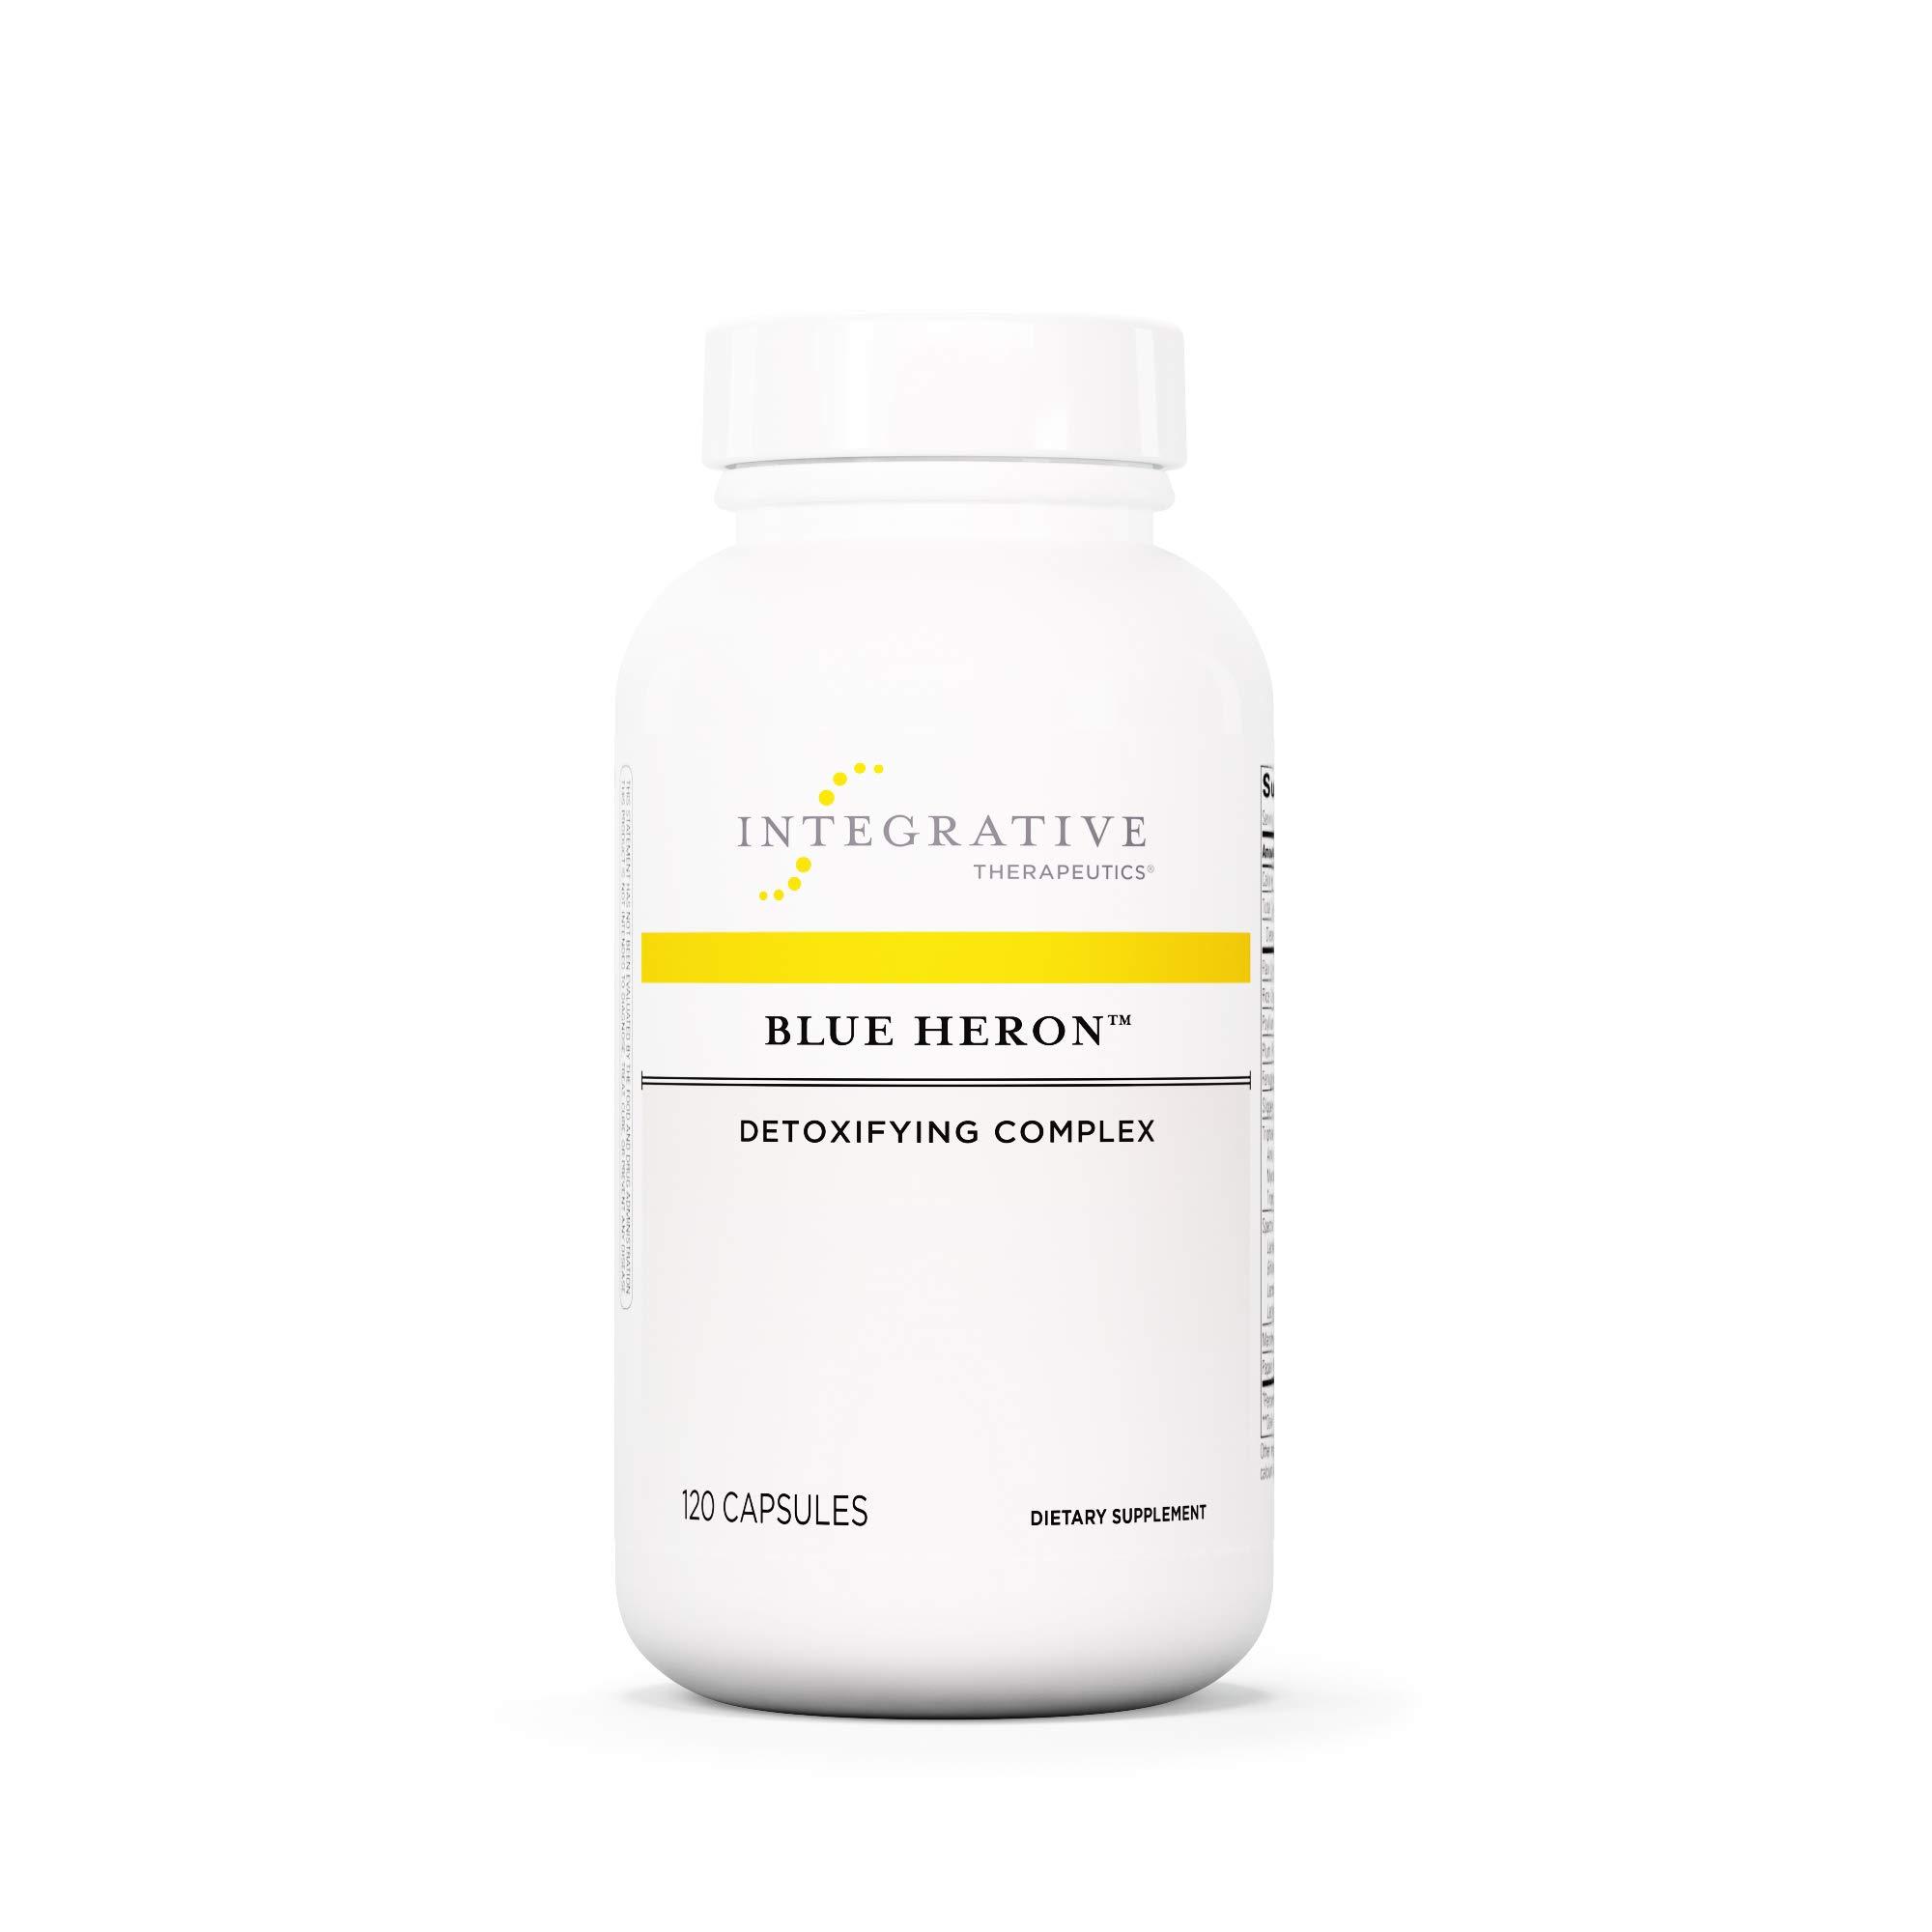 Integrative Therapeutics - Blue Heron - Detoxifying Complex with Dietary Fiber, Herbs, and Probiotics - 120 Capsules